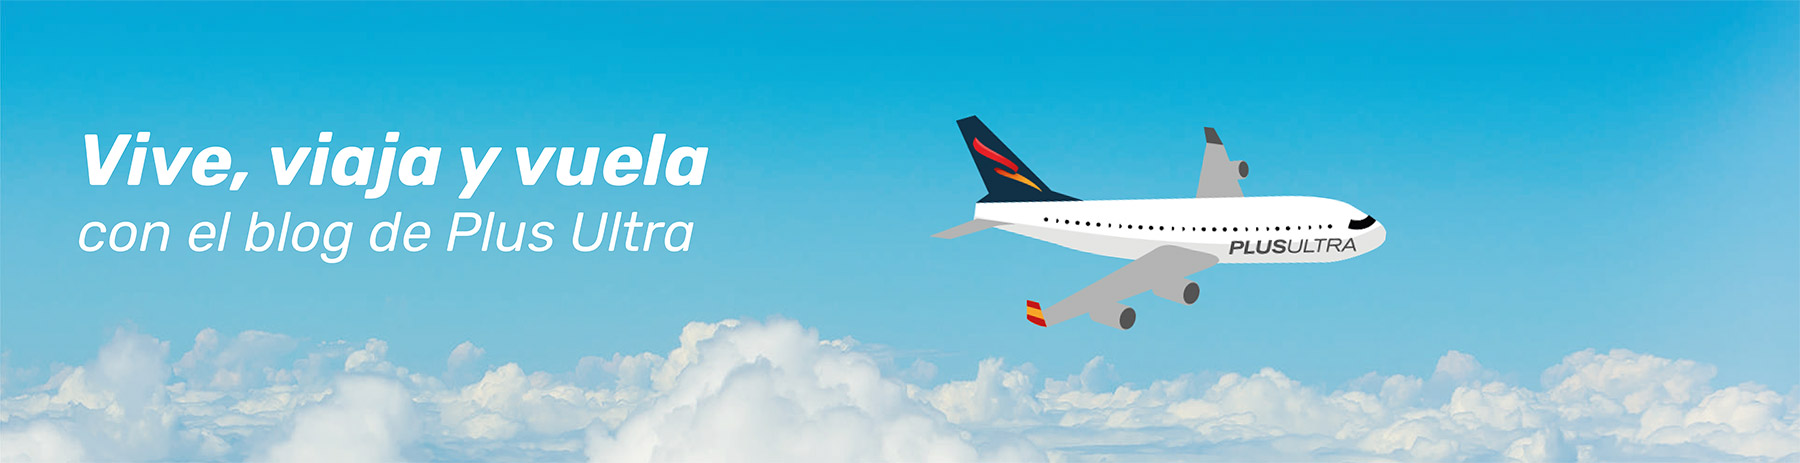 El blog de Plus Ultra: Vive, viaja, vuela